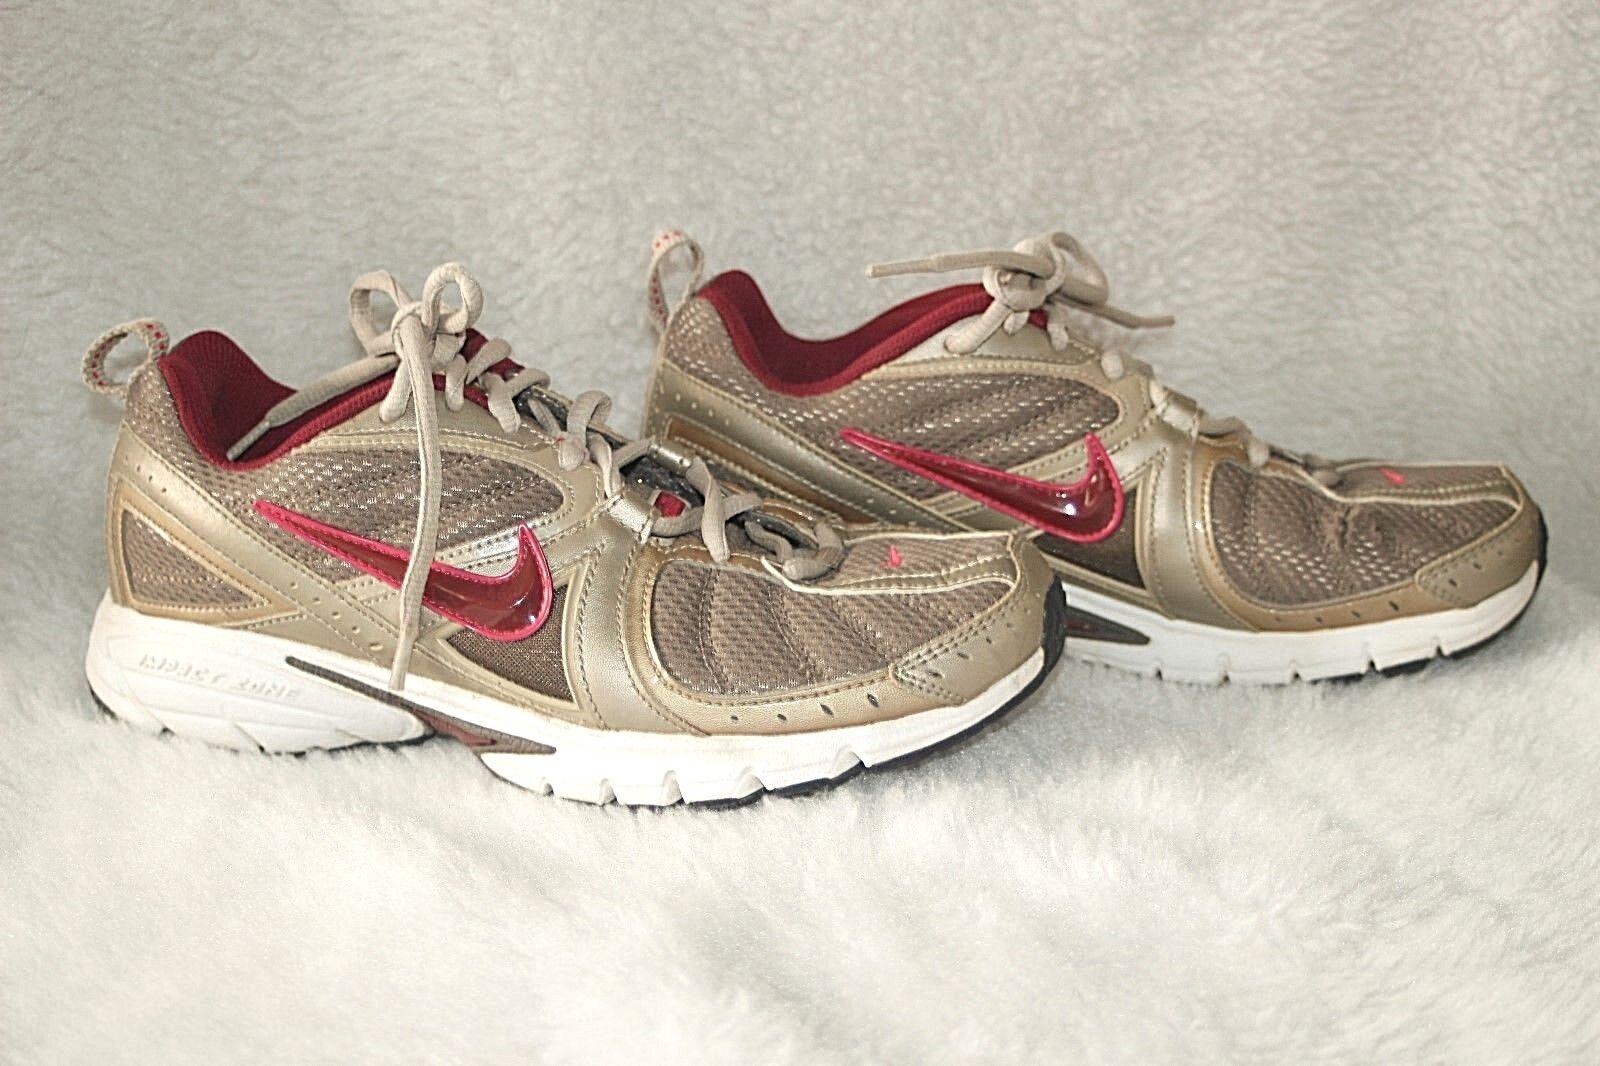 NIKE Womens Running Shoes 316064-261